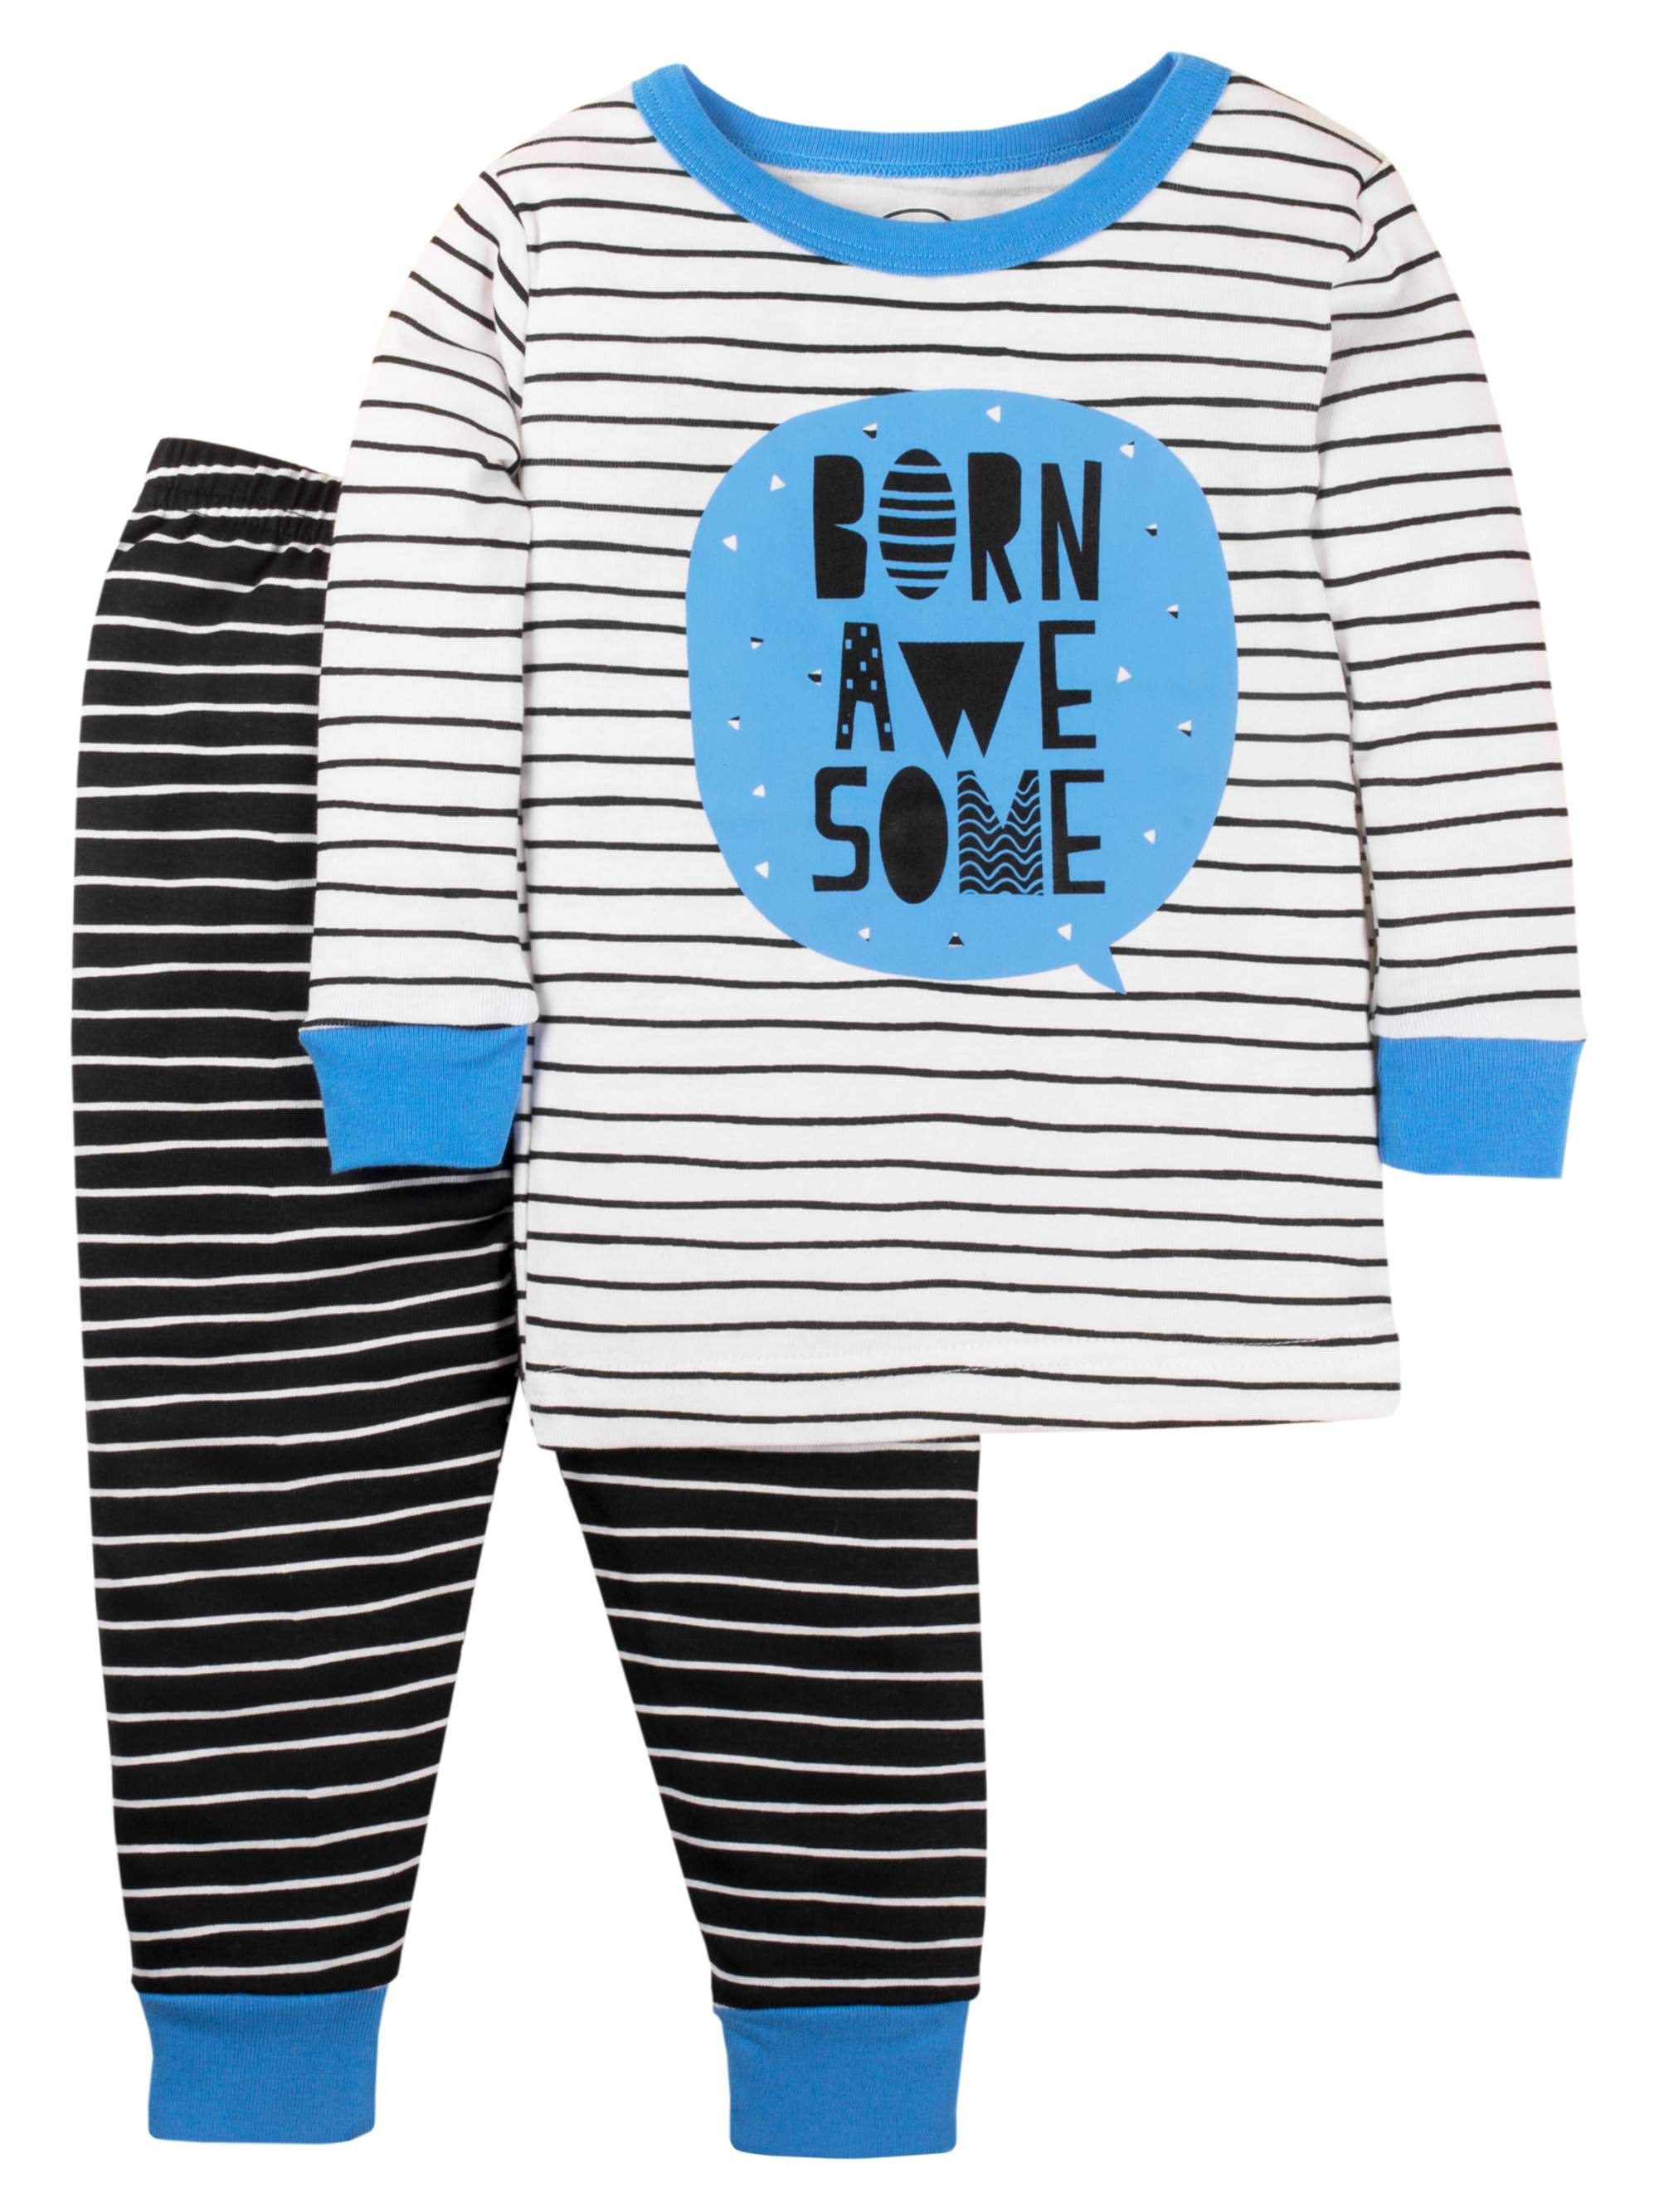 b4fa9d0ee Lamaze - Cotton Long Sleeve T-Shirt   Pants